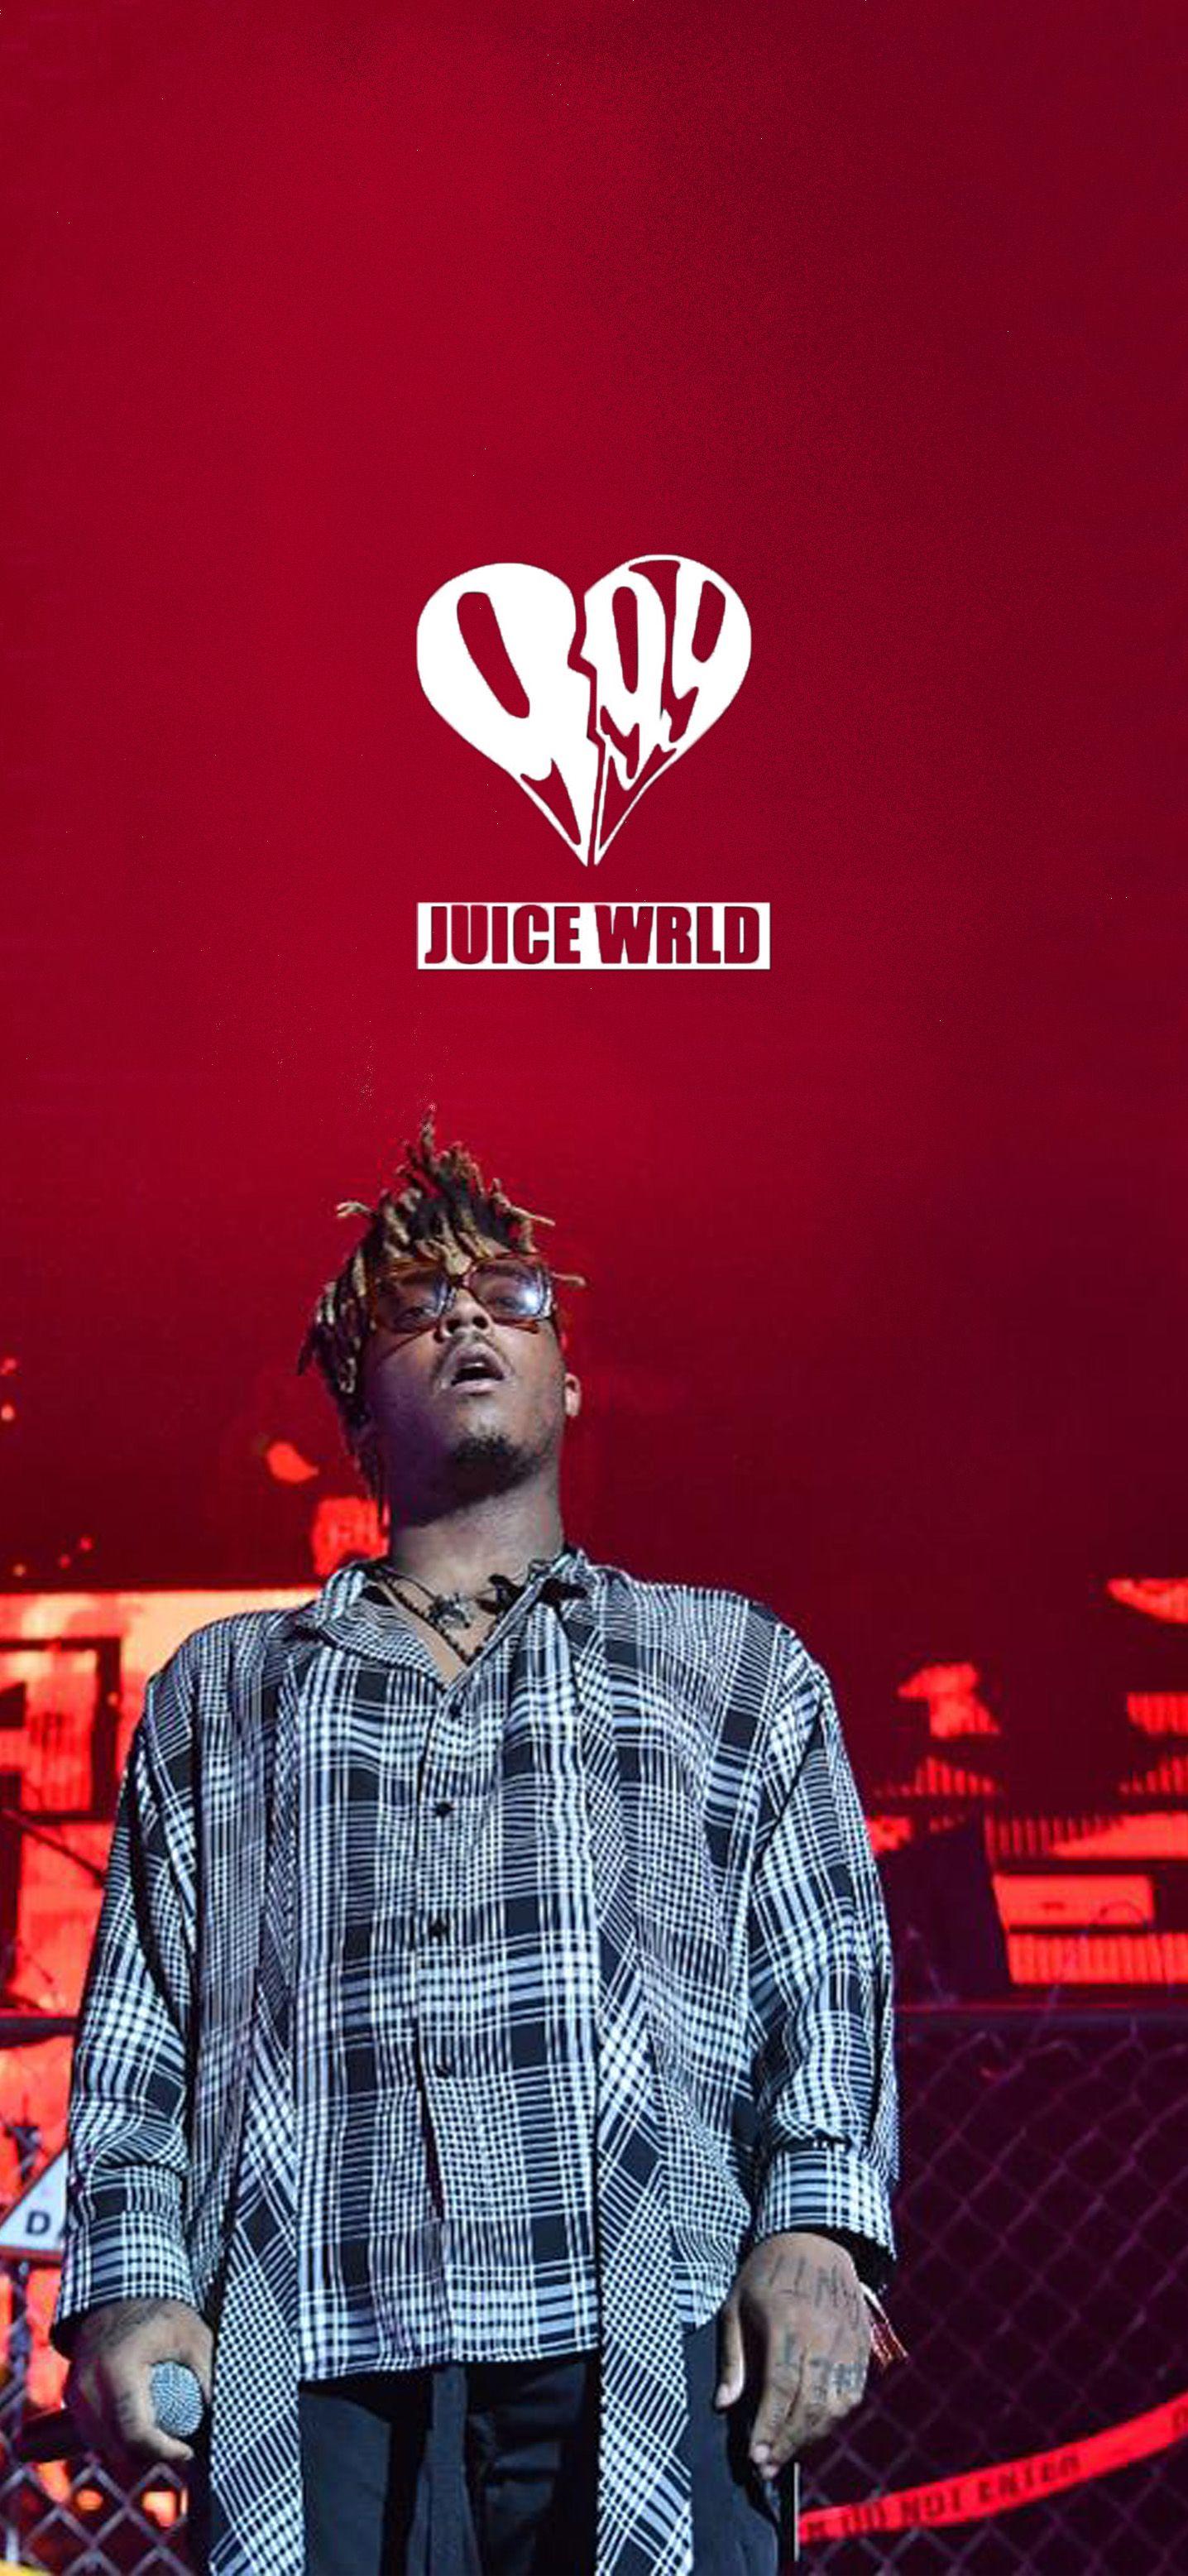 Juice Wrld Wallpaper Red Aesthetic Grunge Juice Rapper Rapper Wallpaper Iphone